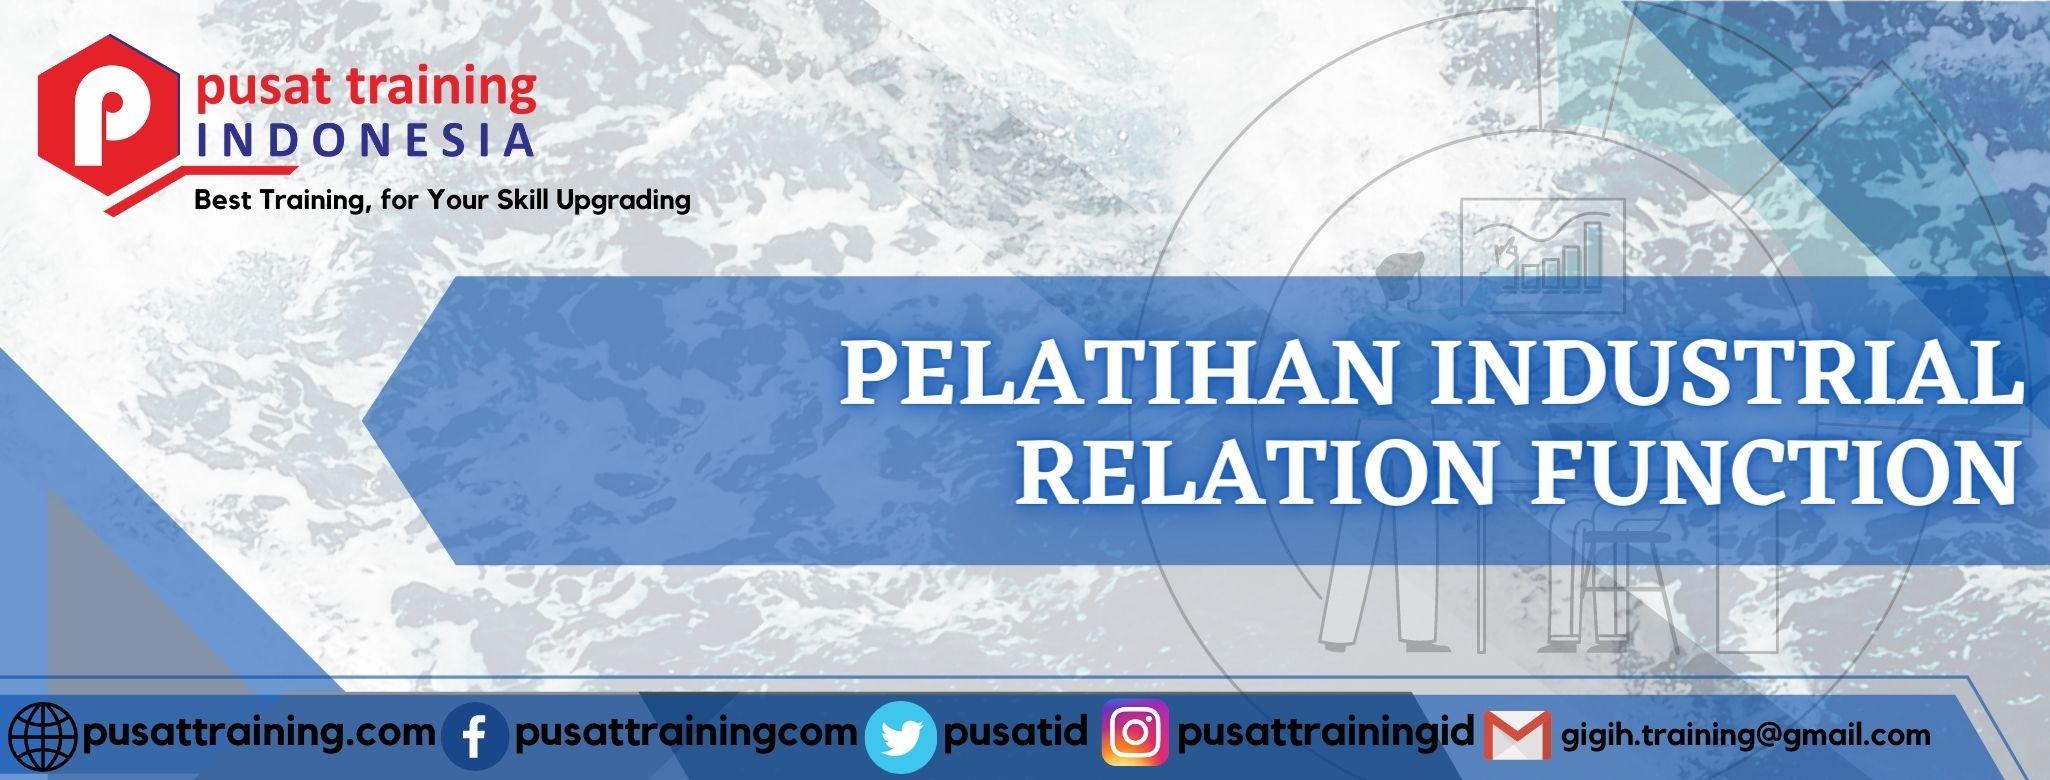 pelatihan-industrial-relation-function